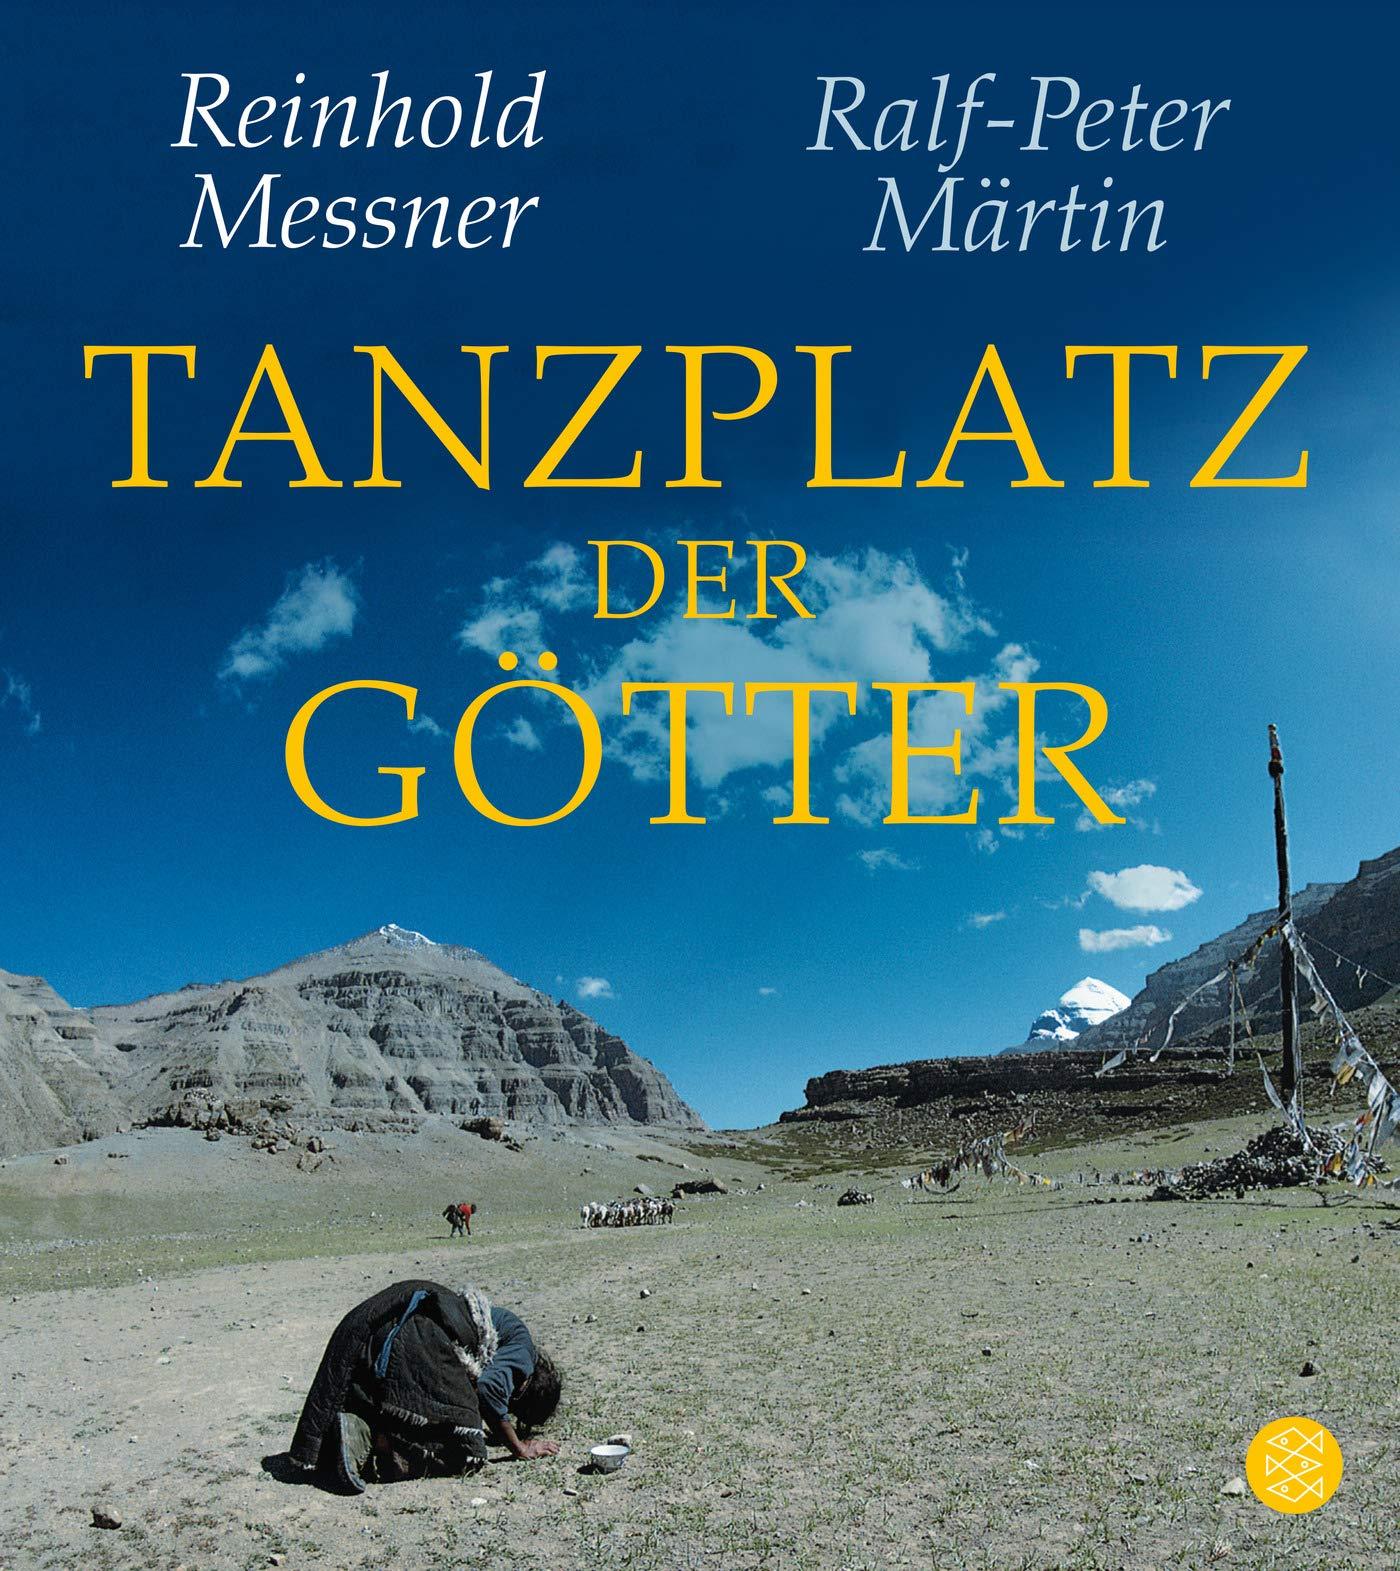 Tanzplatz der Götter Taschenbuch – 26. Juni 2019 Reinhold Messner Ralf-Peter Märtin Tanzplatz der Götter FISCHER Taschenbuch